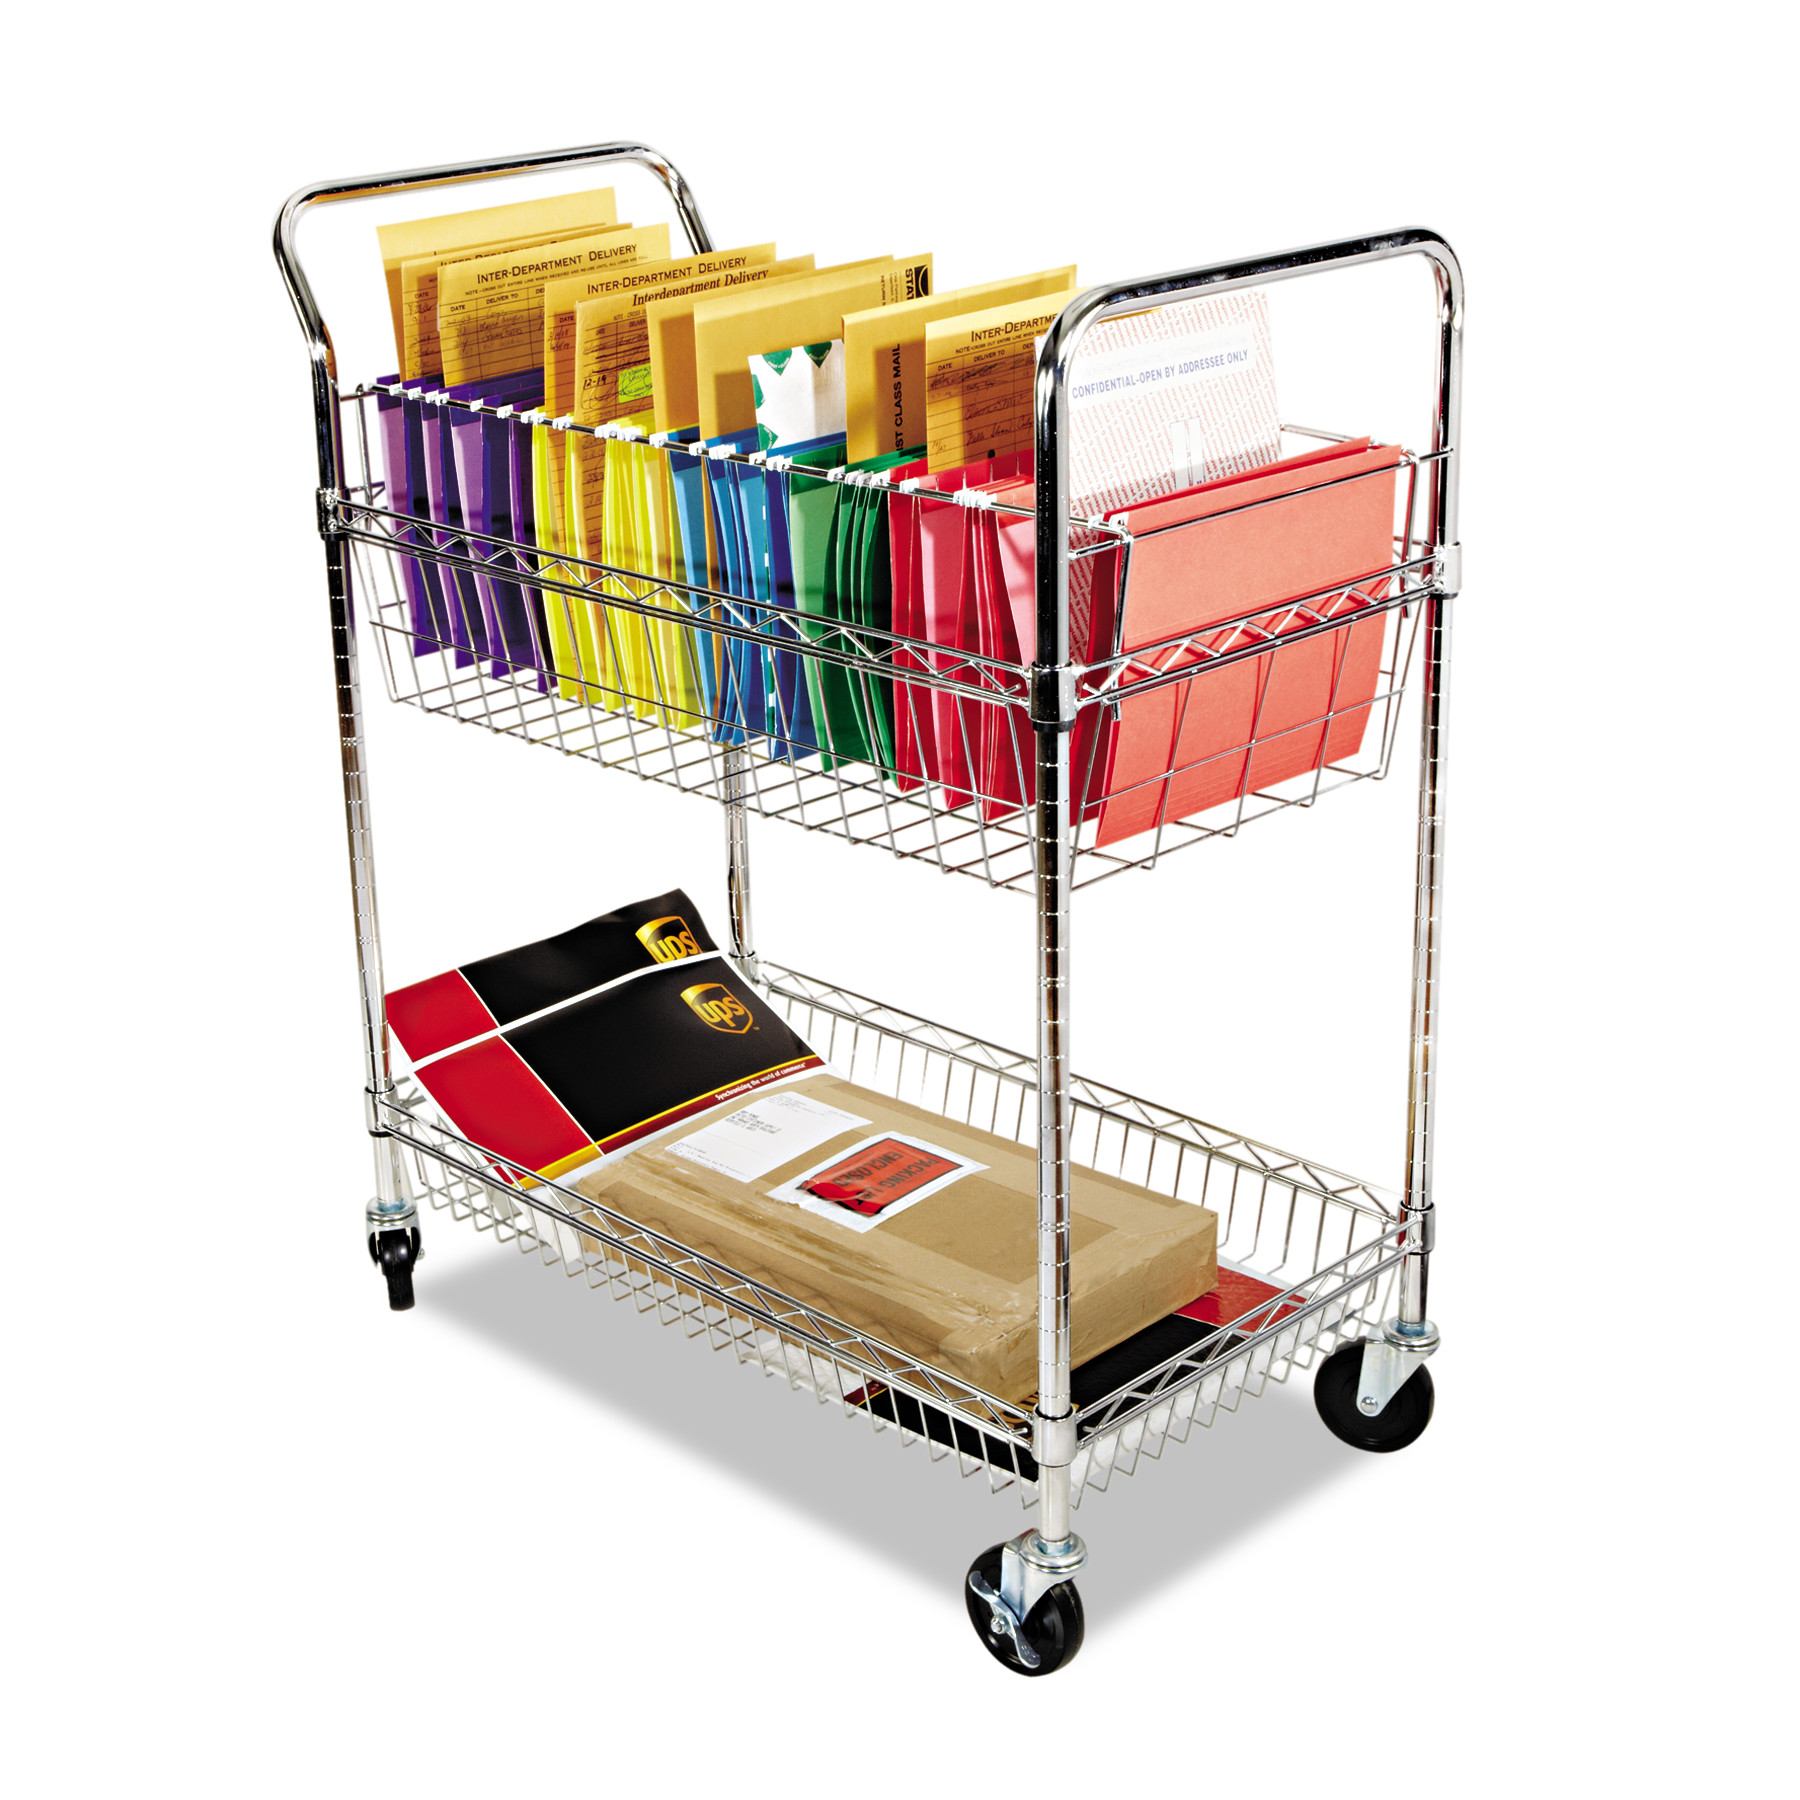 Alera Carry-all Cart/Mail Cart, Two-Shelf, 34-7/8w x 18d x 39-1/2h, Silver -ALEMC3518SR